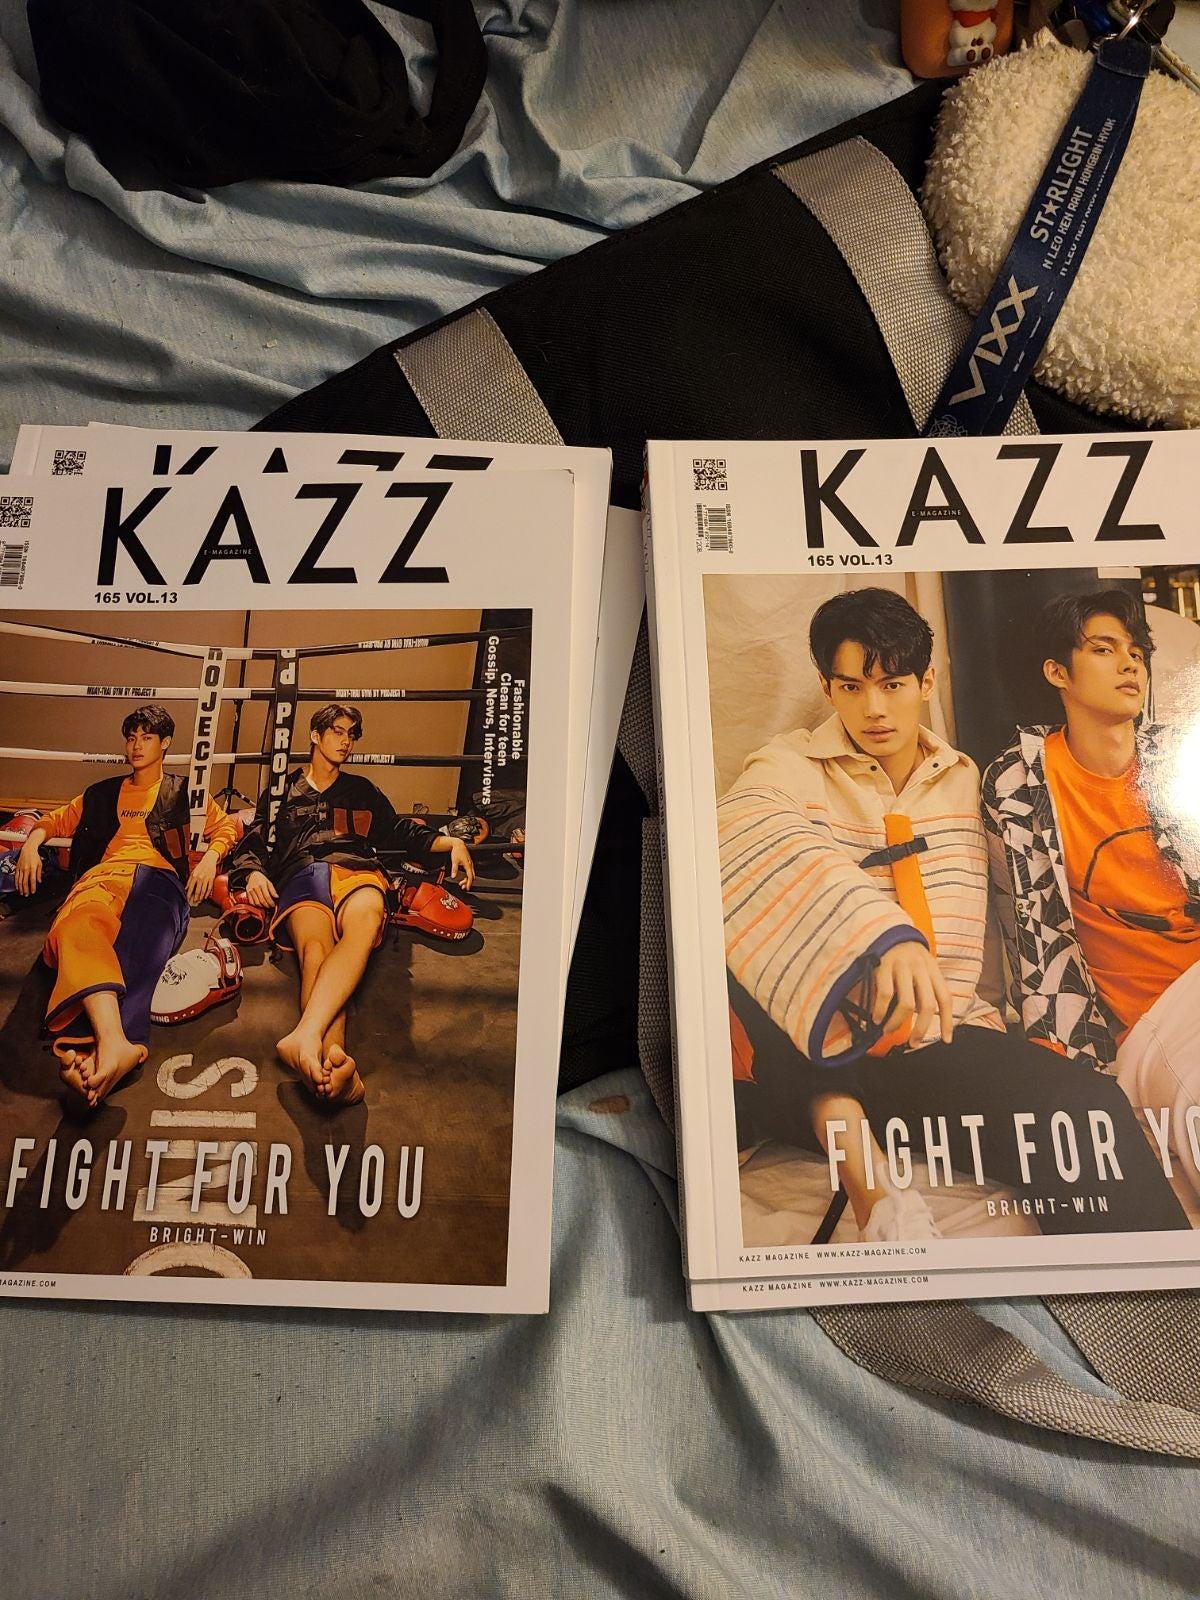 Kazz bright win magazine